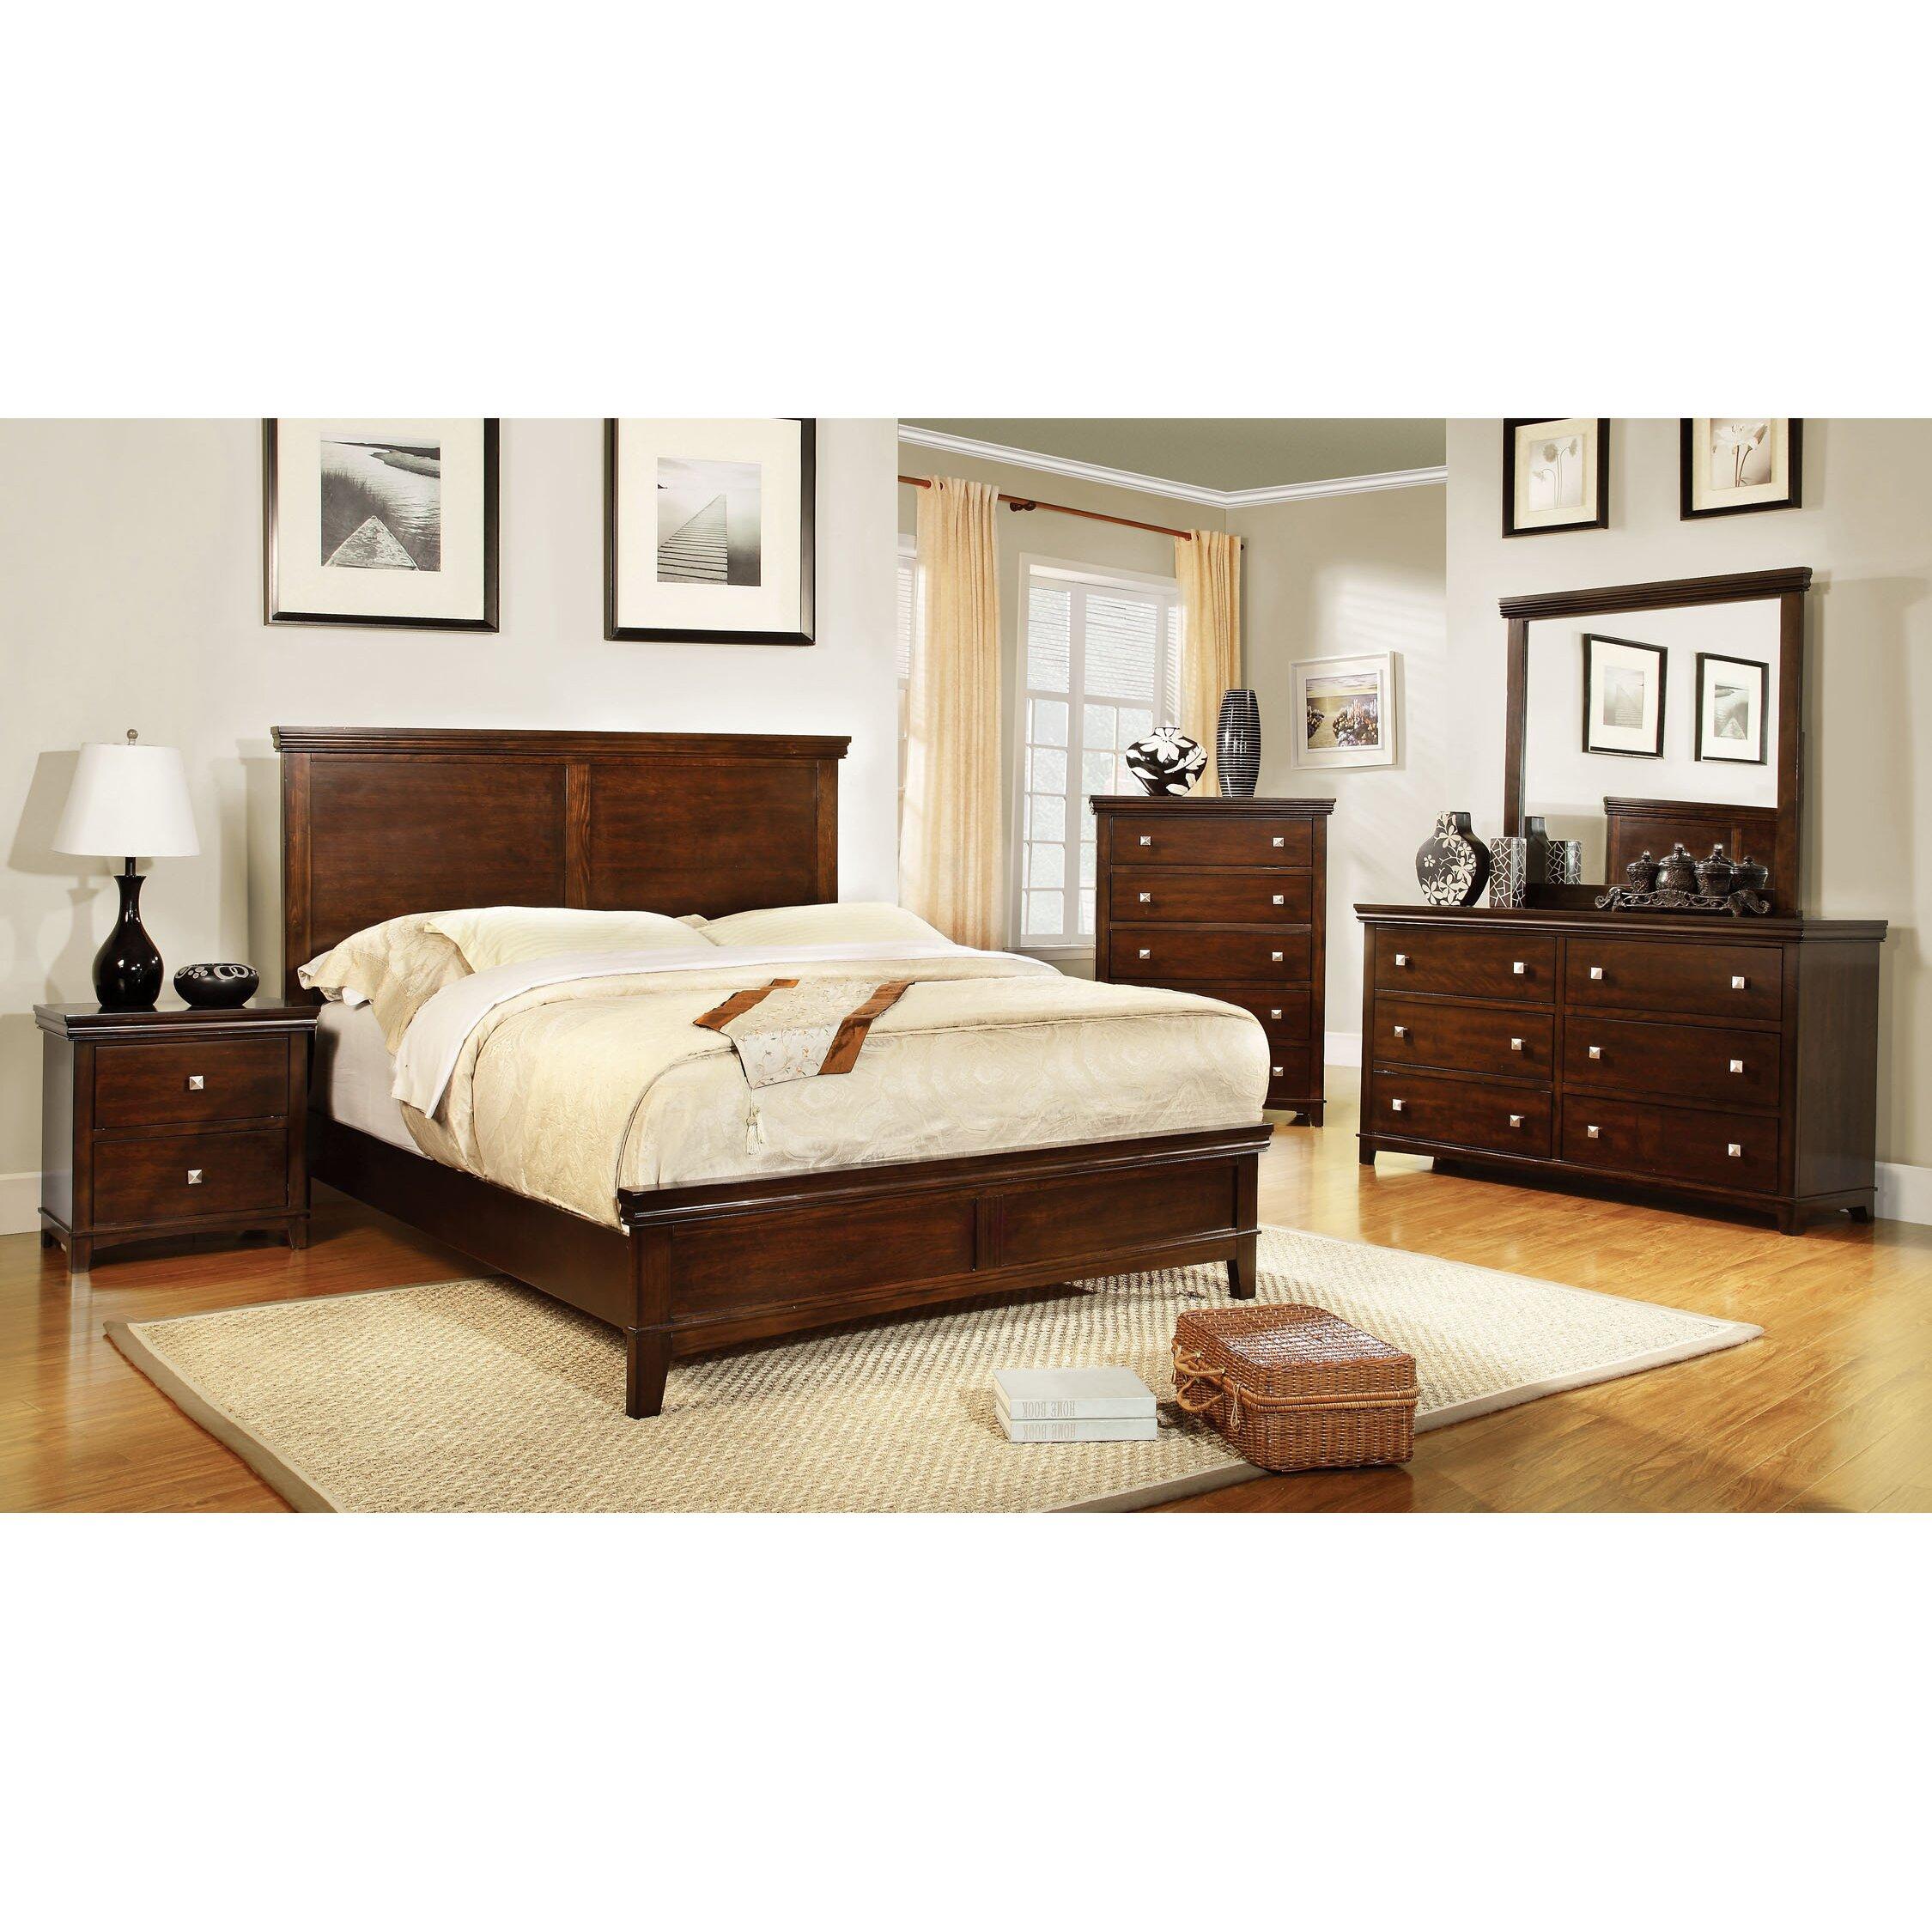 Wayfair Bedroom Furniture: Darby Home Co Platform Customizable Bedroom Set & Reviews